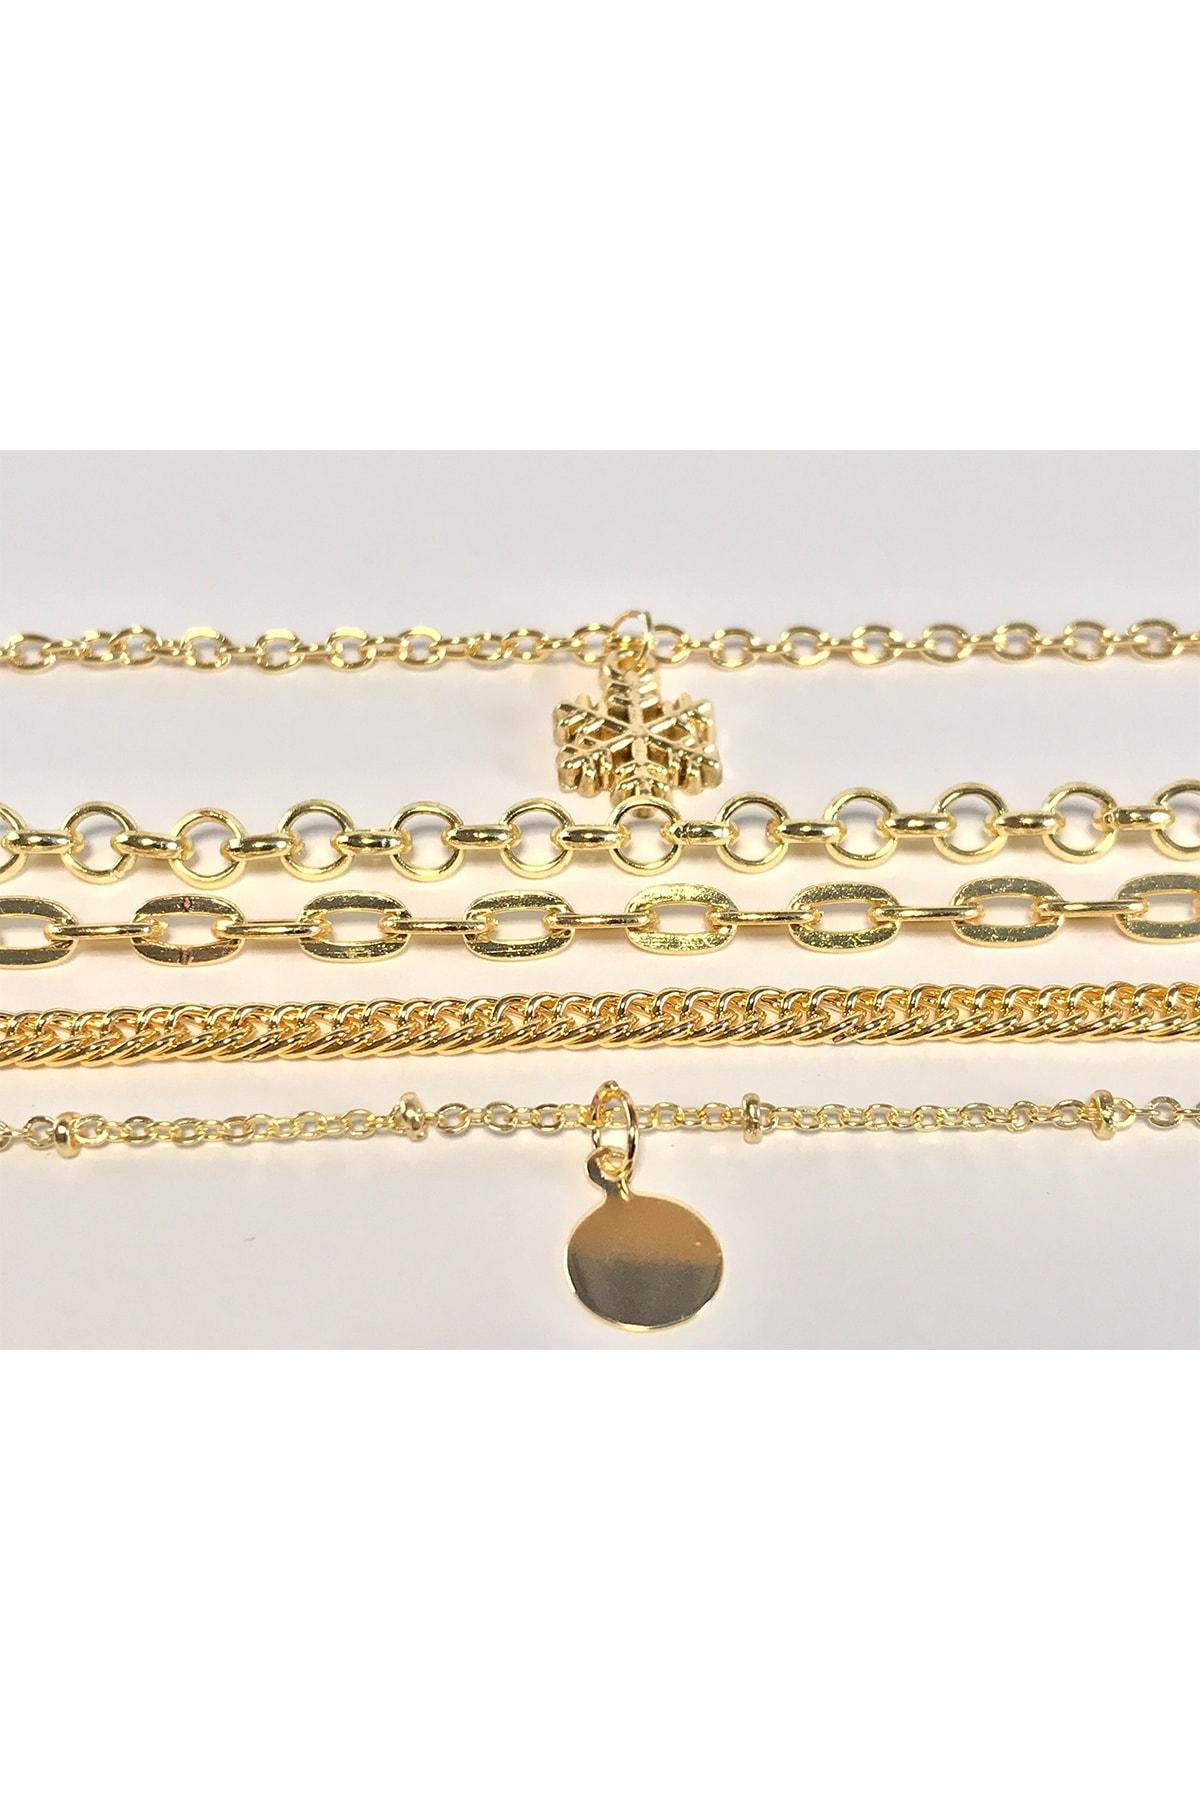 Mom's Concept 5'li Gold Renk Kar Tanesi Zincir Bileklik 2